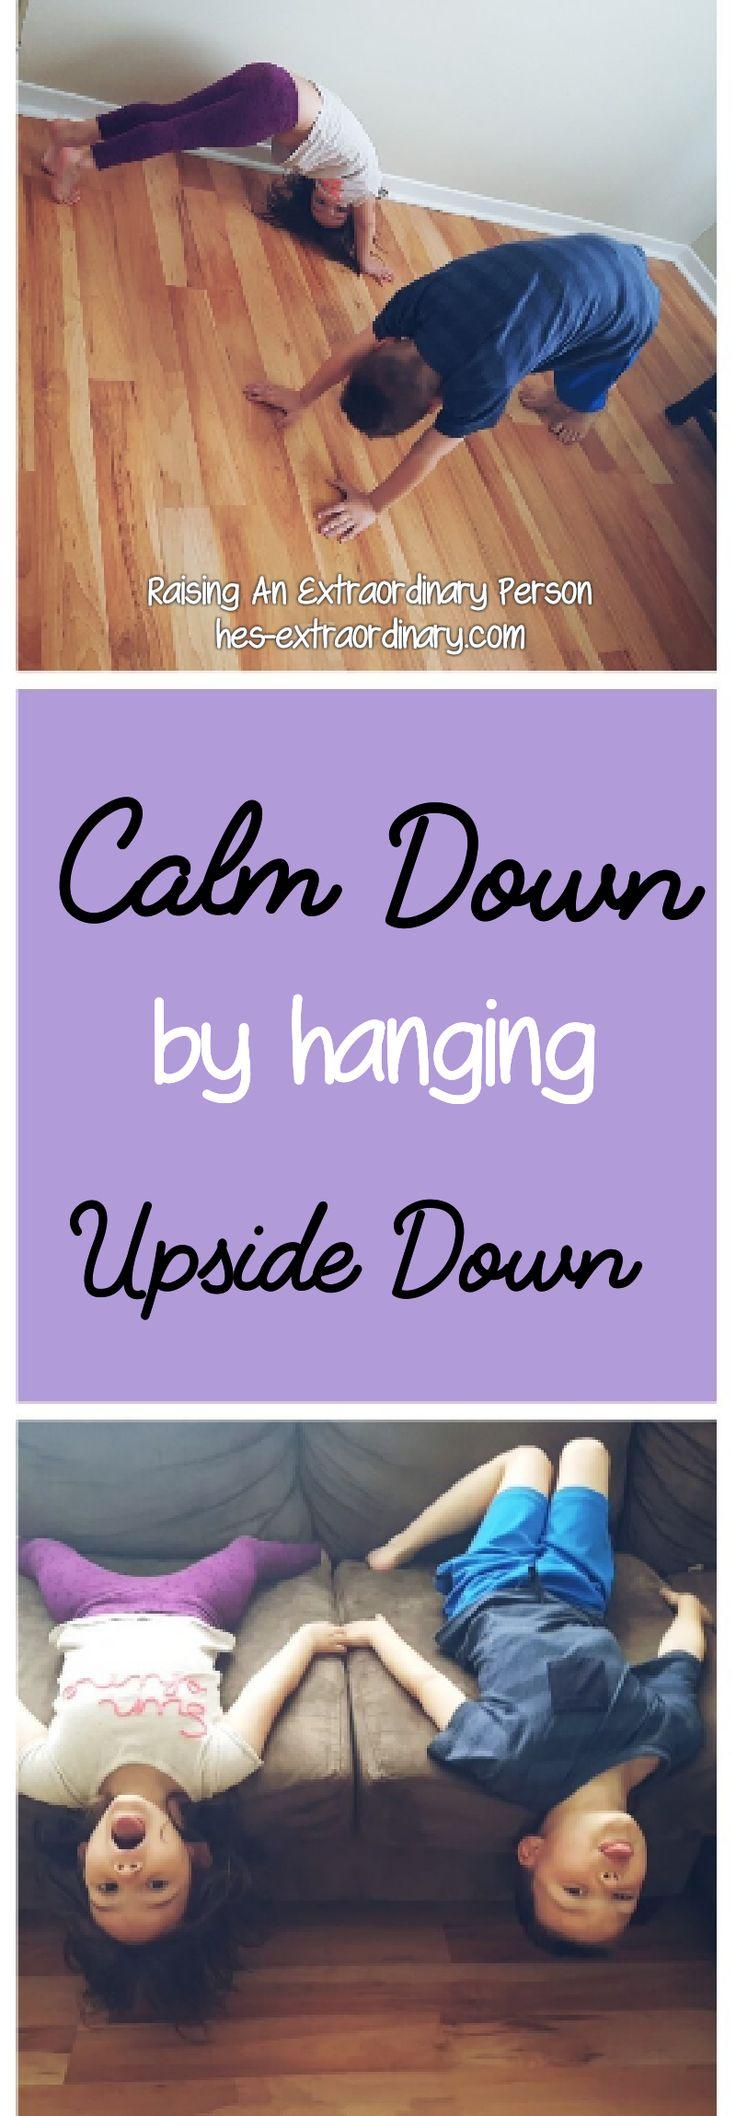 Hanging Upside Down to Prevent Sensory Meltdowns: Vestibular Input